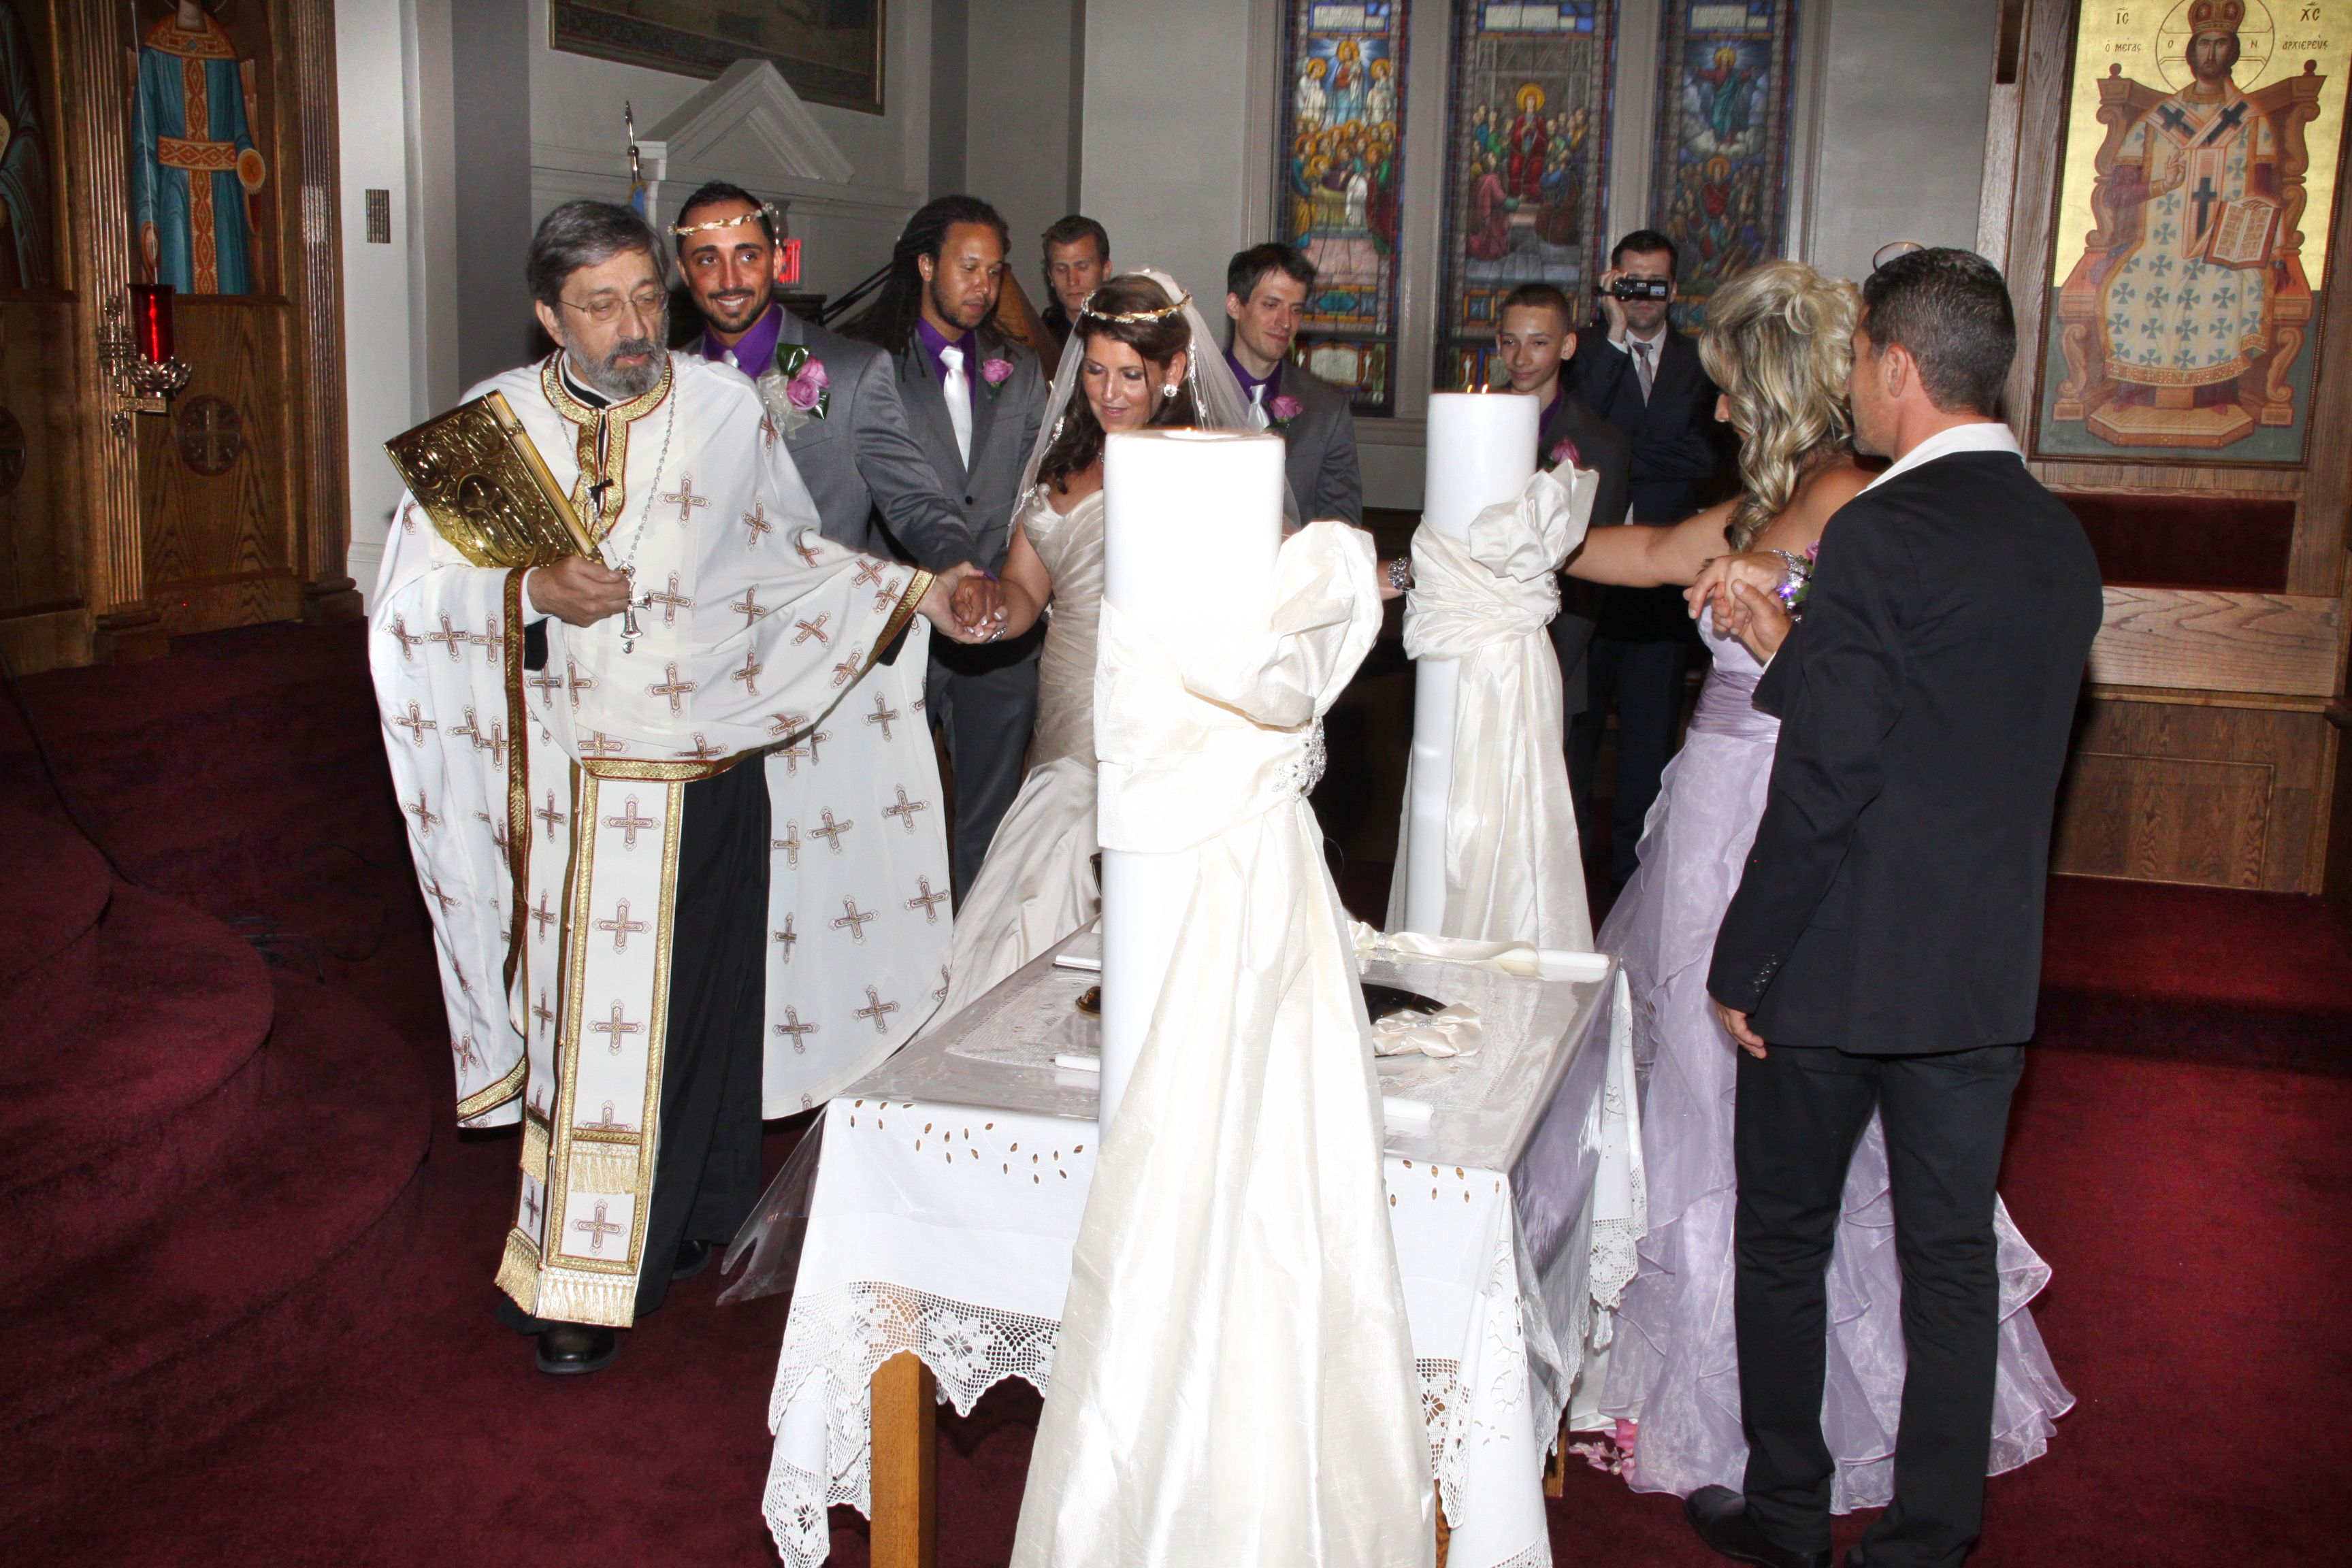 Greek Wedding Greek Wedding Orthodox Wedding Greek Wedding Traditions